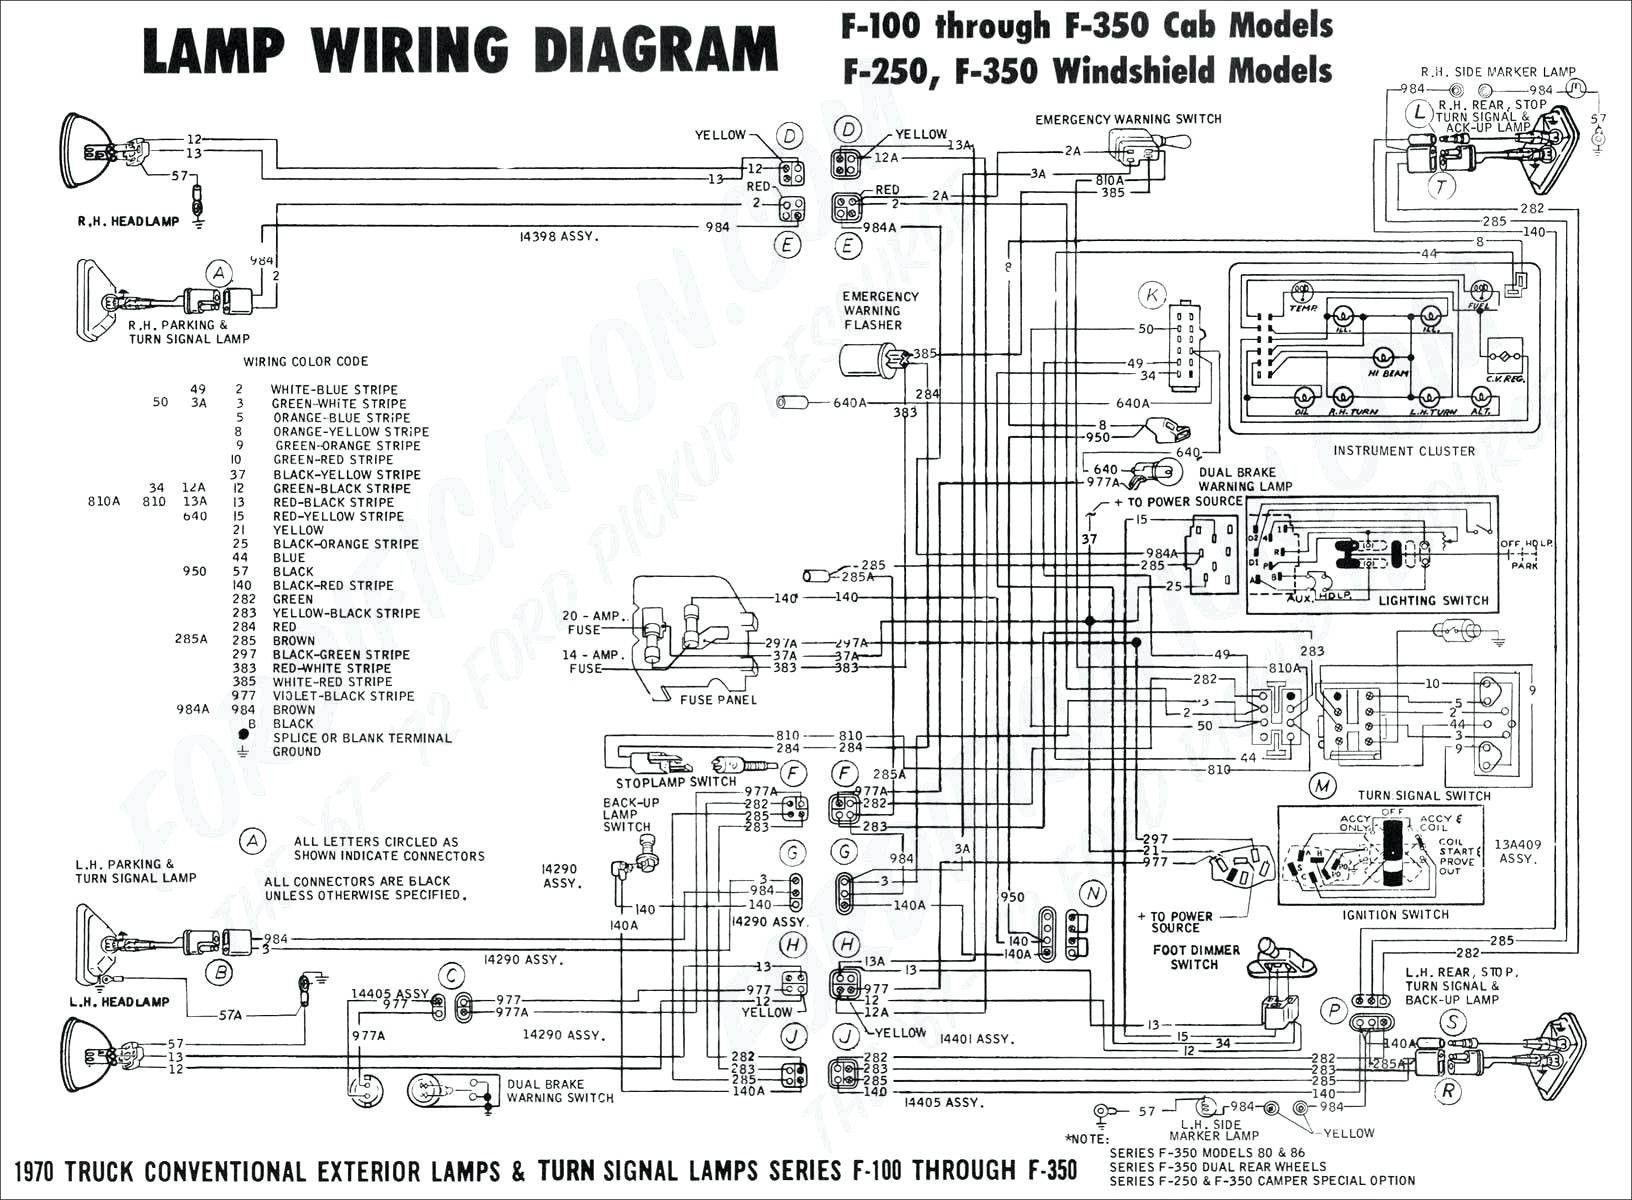 Massey Ferguson Wiring Diagram in 2020 | Electrical wiring diagram, Diagram,  Trailer wiring diagramPinterest